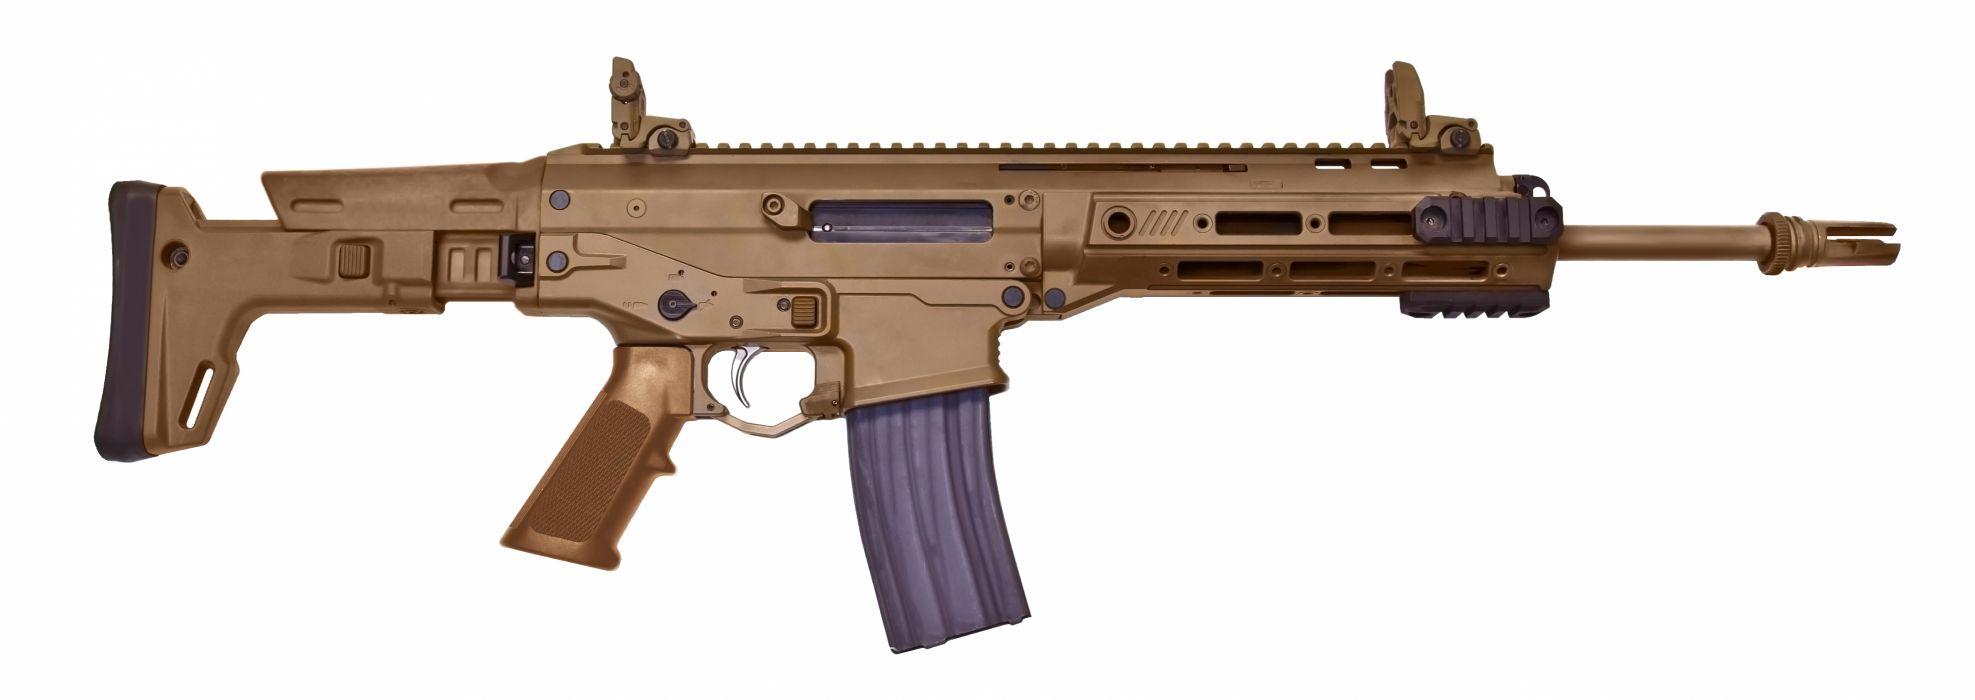 Remington ACR weapon gun military rifle police    y wallpaper